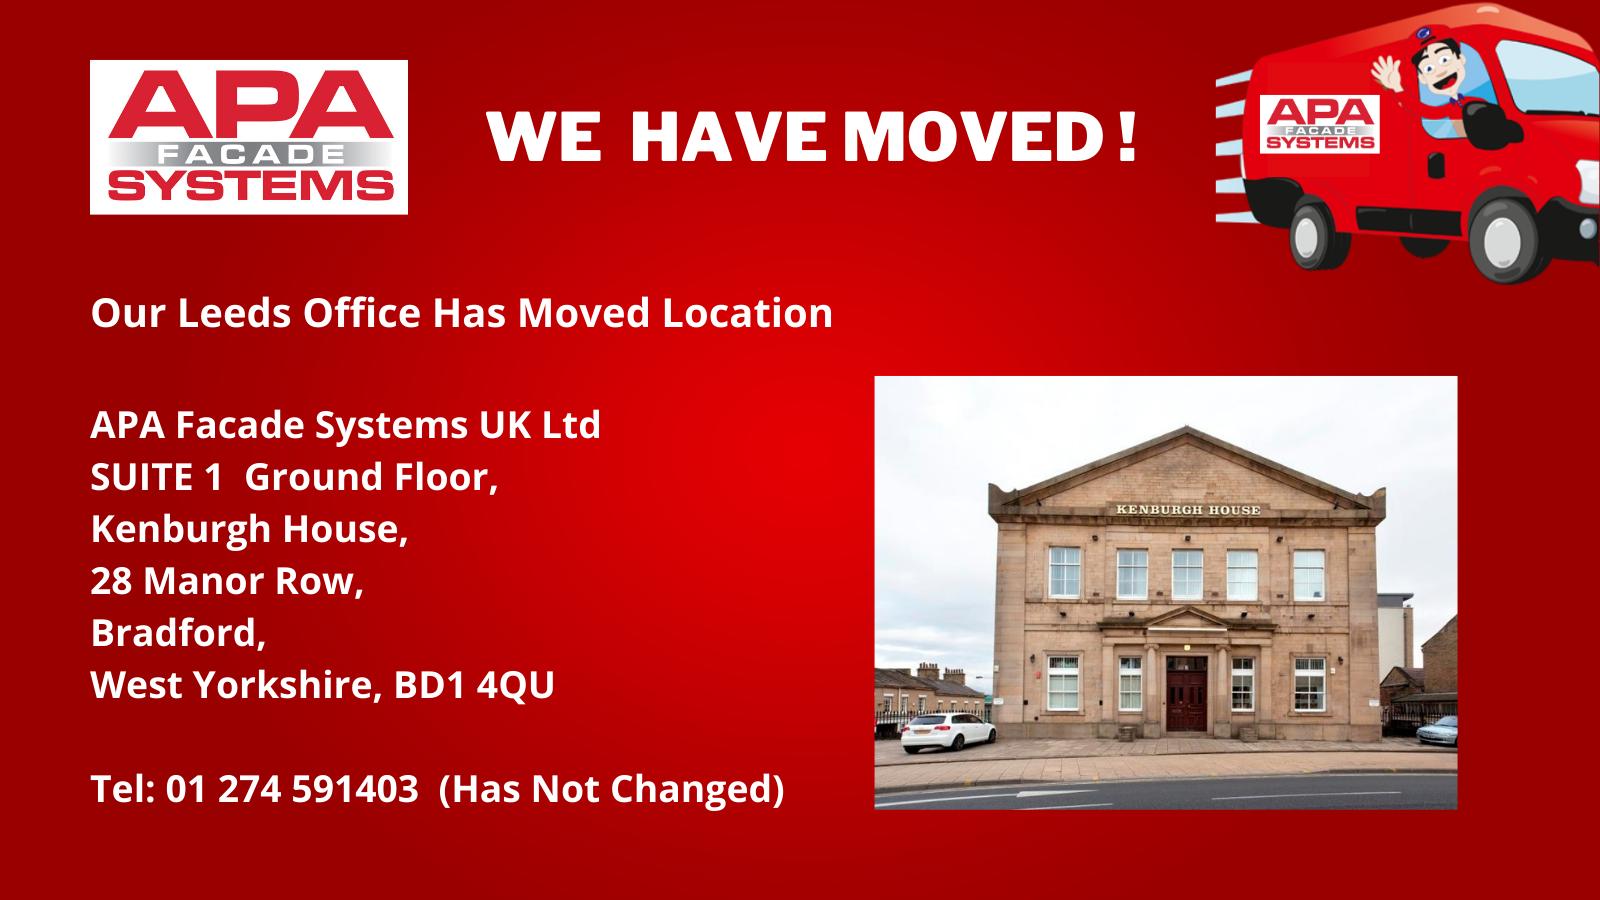 New Leeds Office